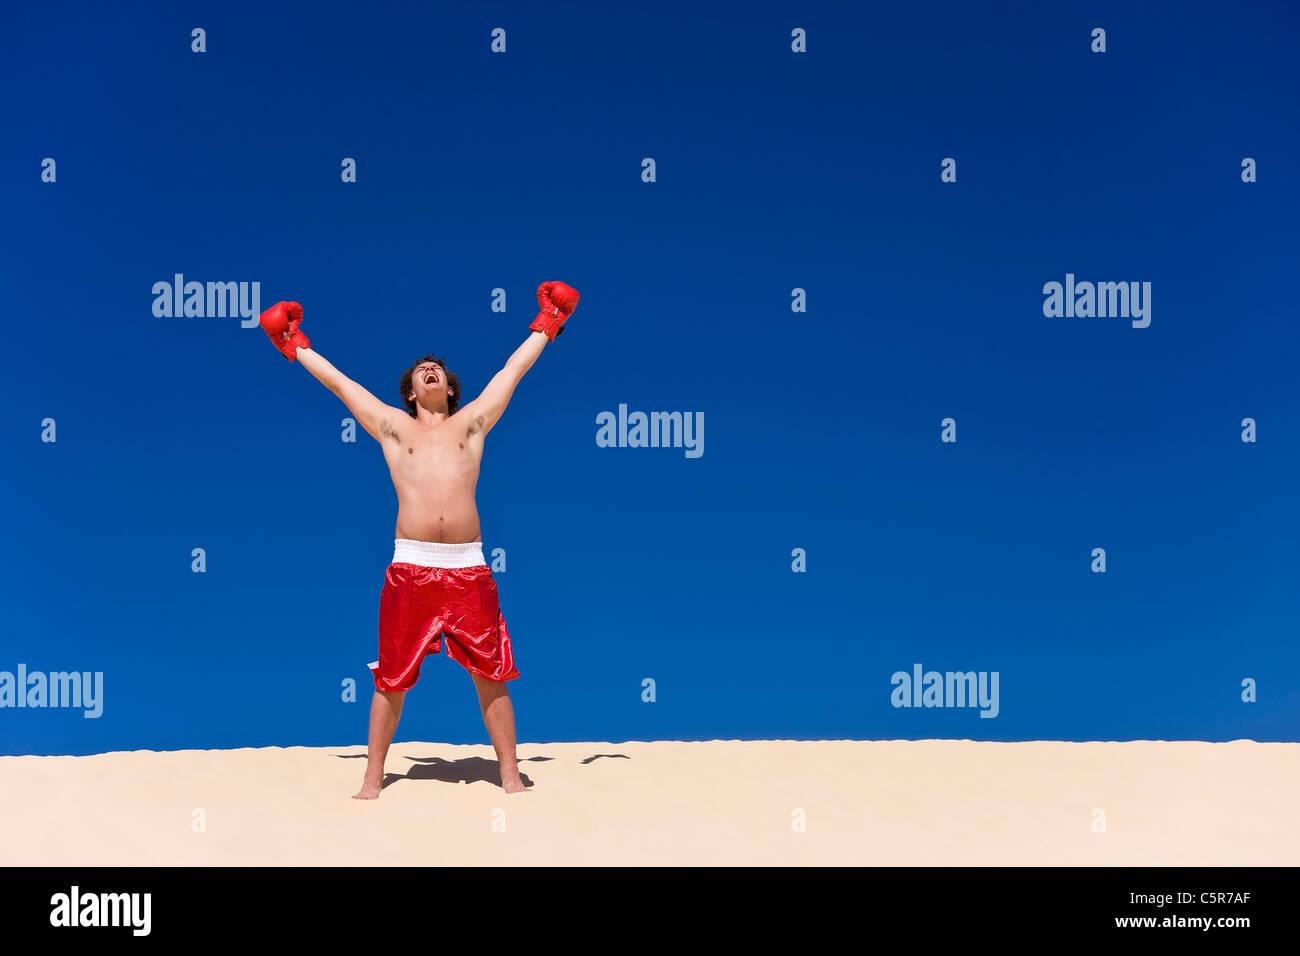 Boxer celebrating - Stock Image